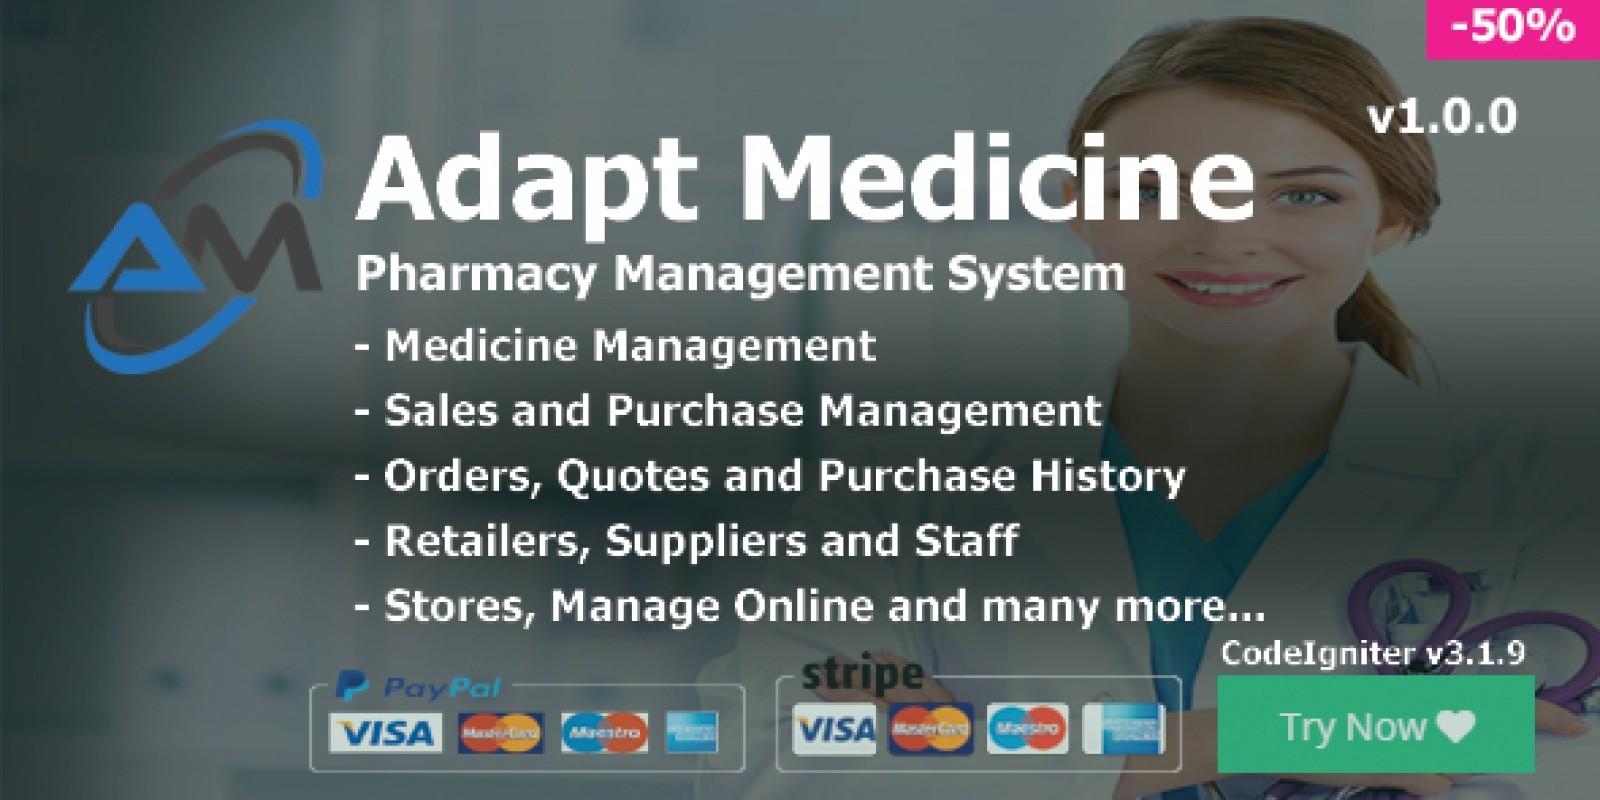 Adapt Medicine - Pharmacy Management System